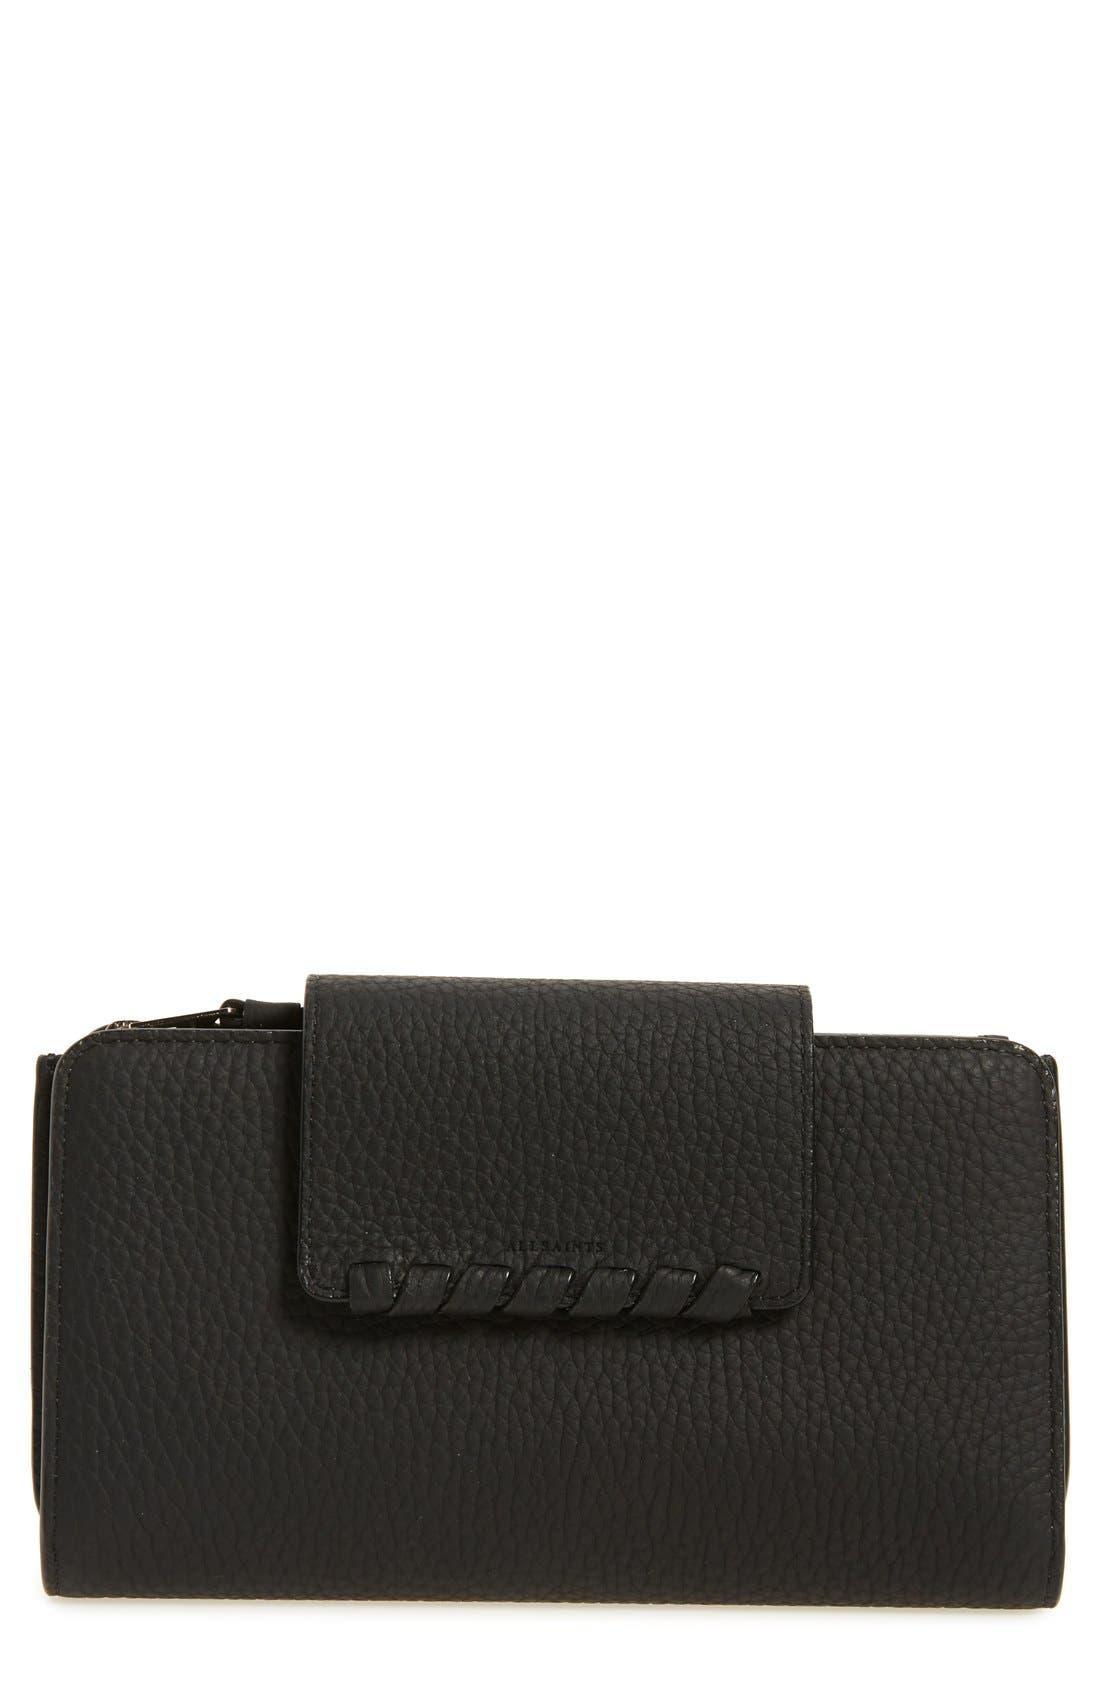 ALLSAINTS Kita Japanese Leather Wallet